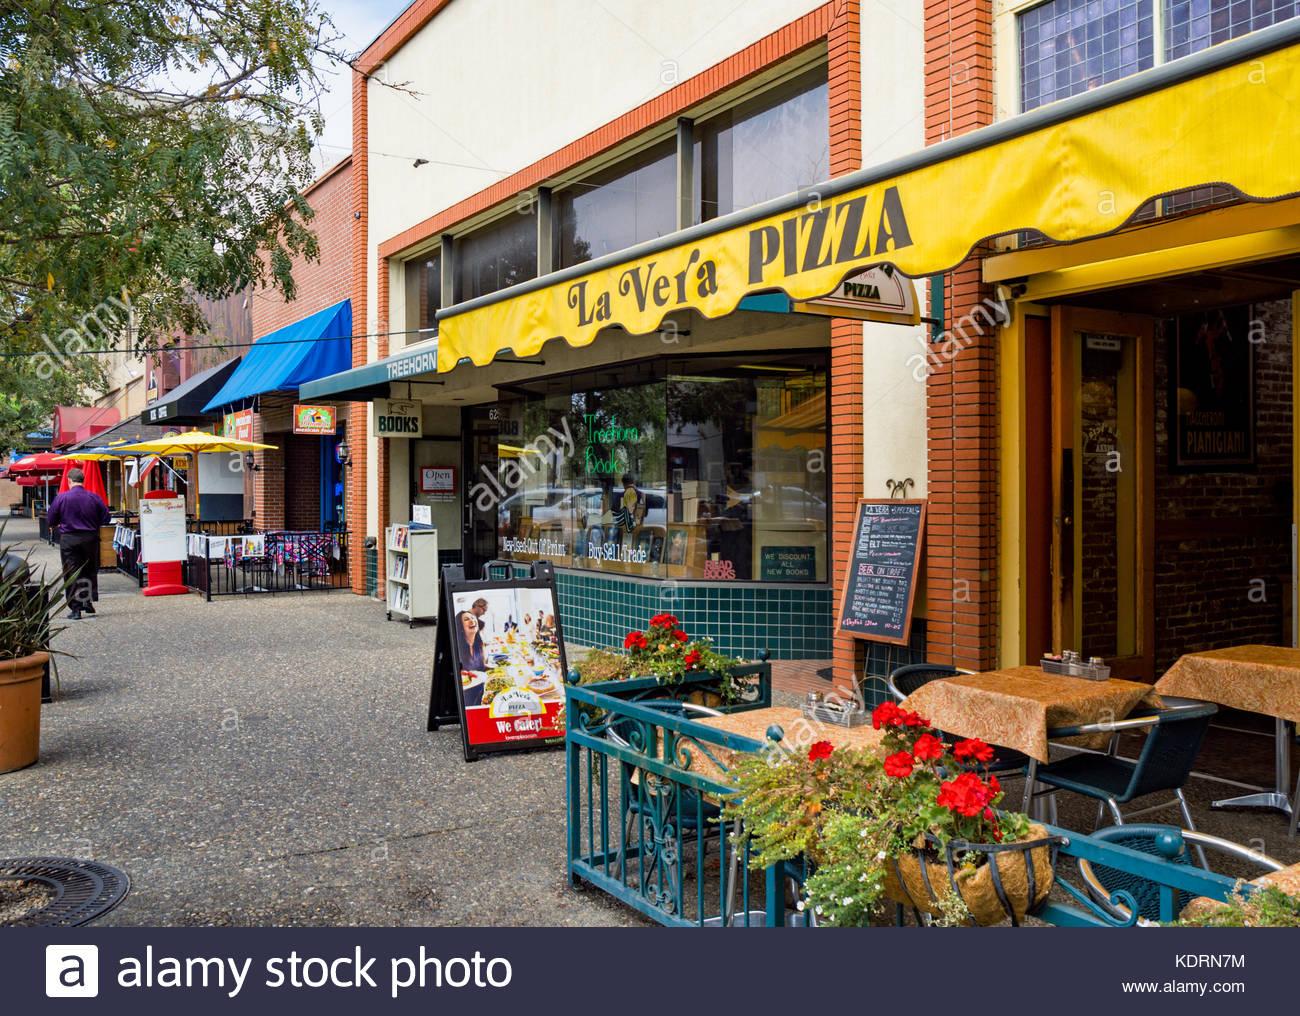 Pizza Shops Stockfotos & Pizza Shops Bilder - Alamy